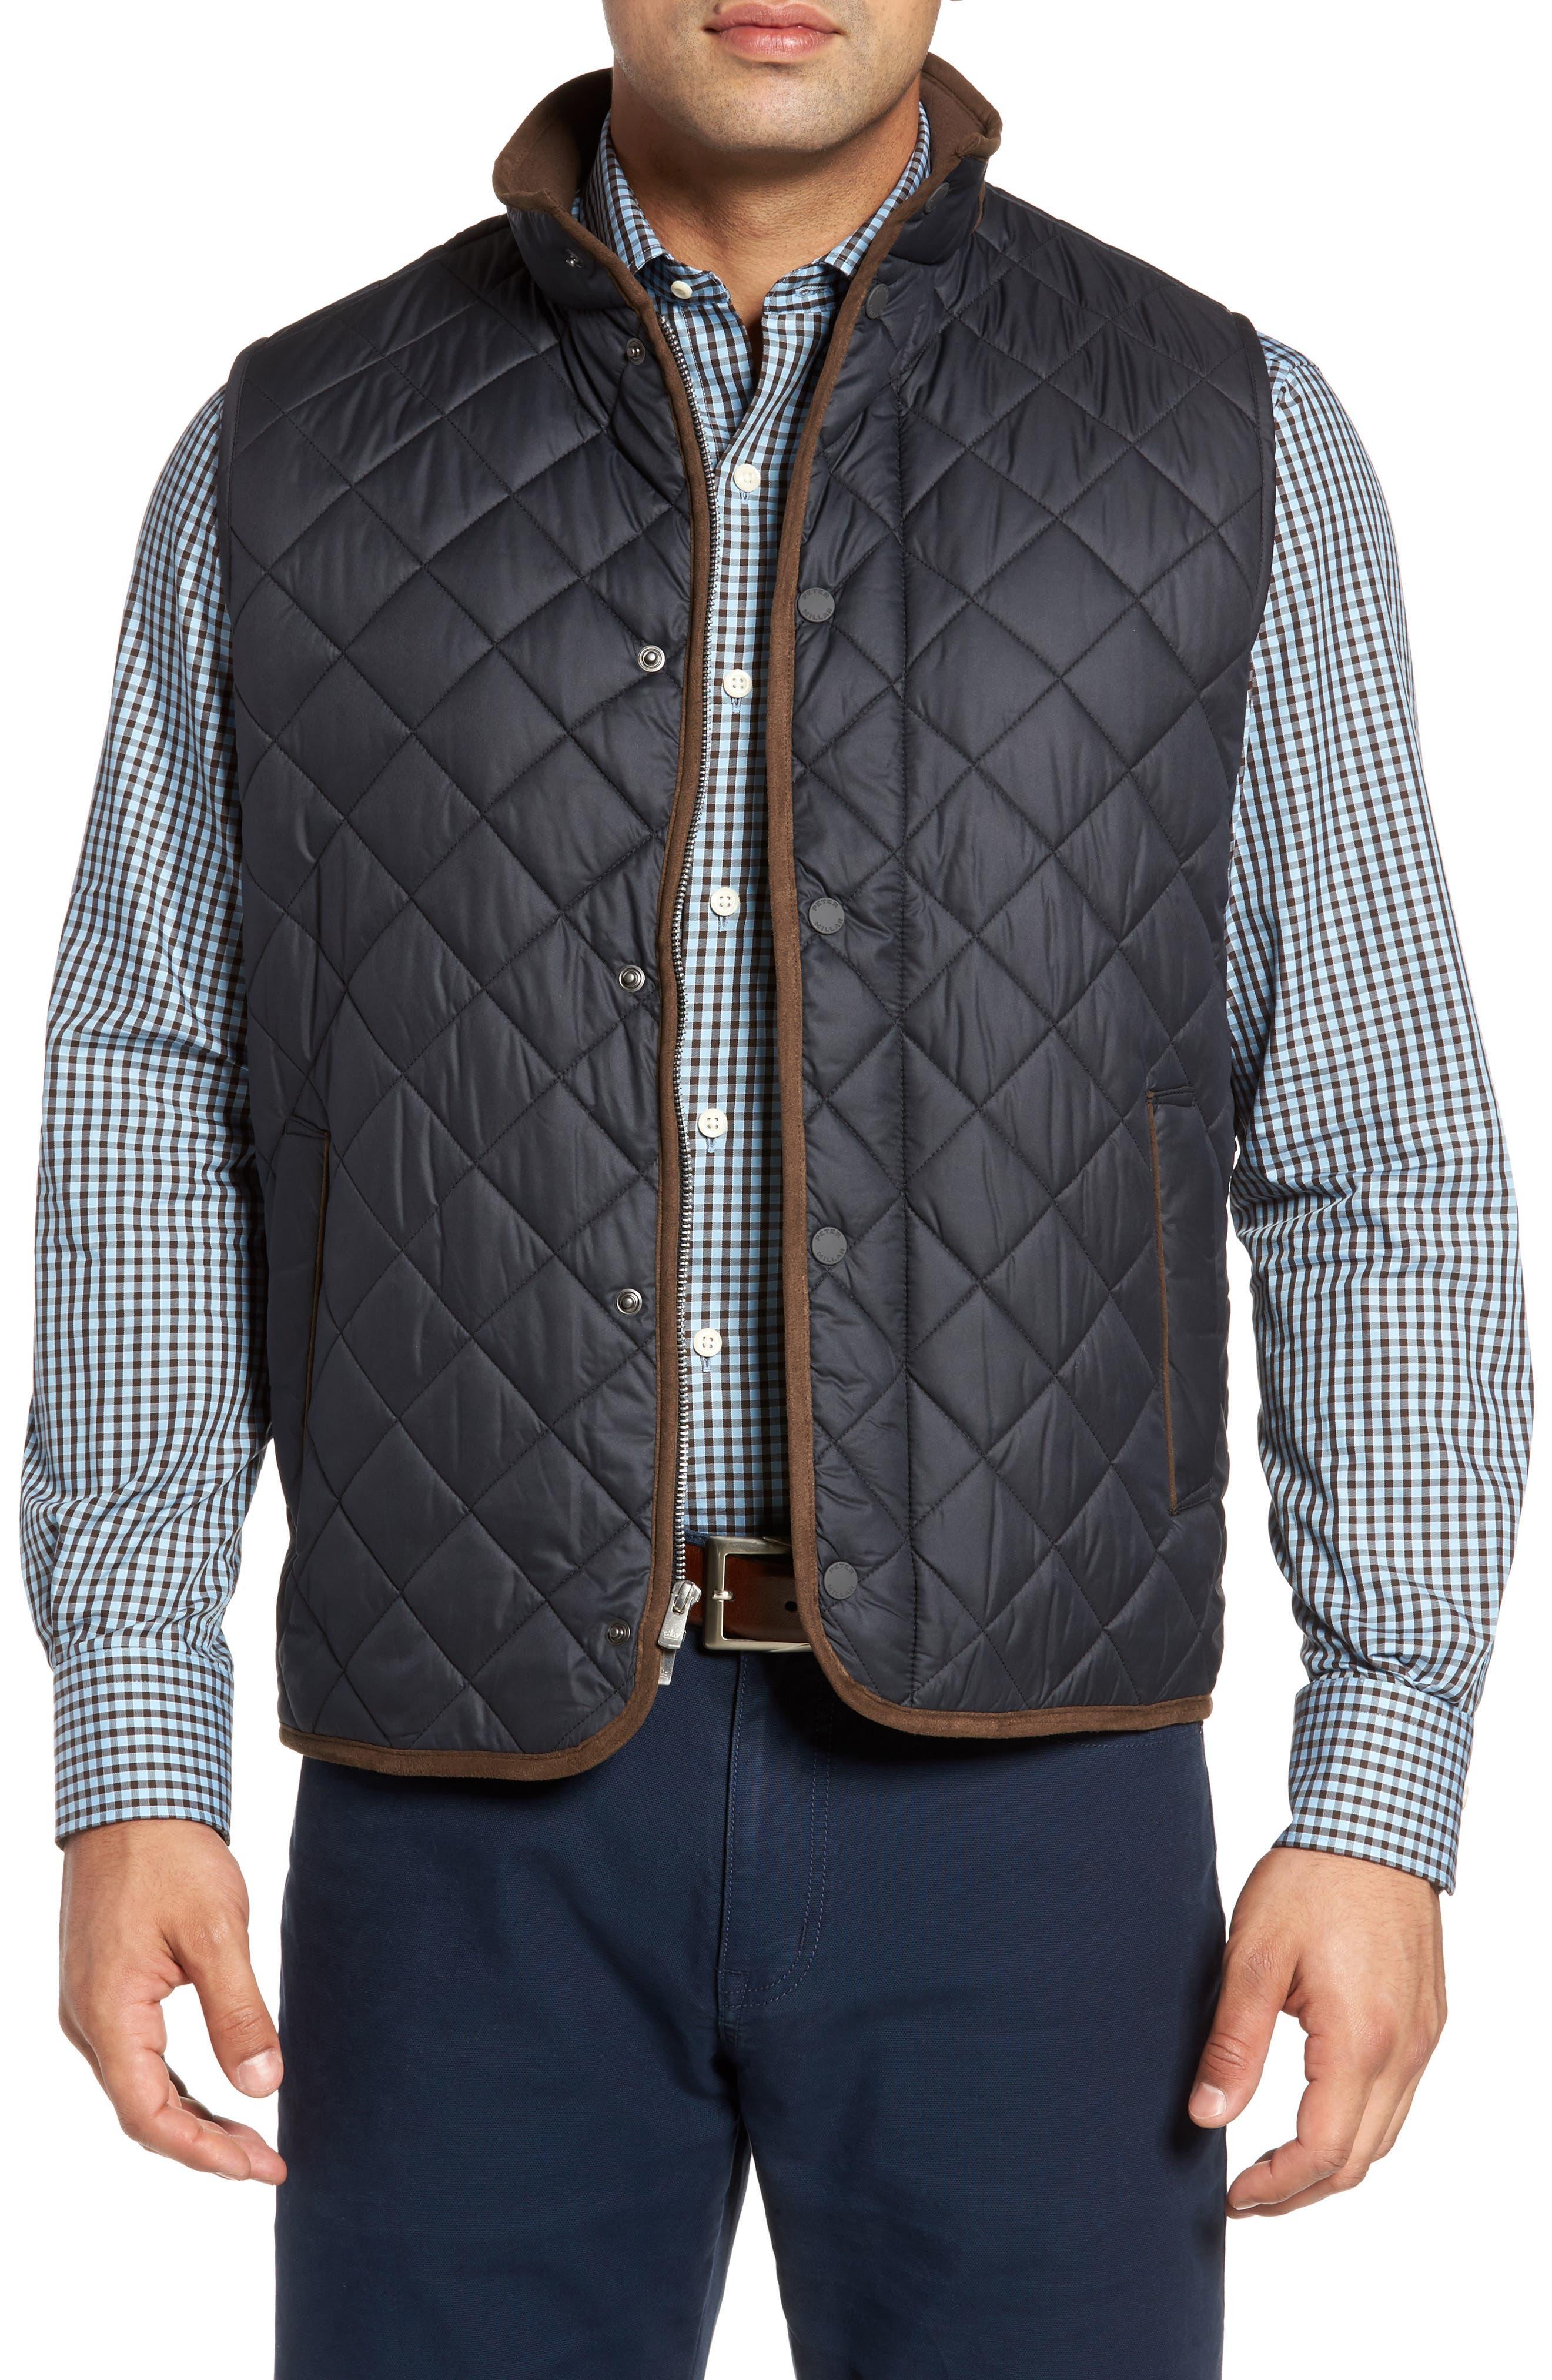 Peter Millar Essex Quilted Vest, Black